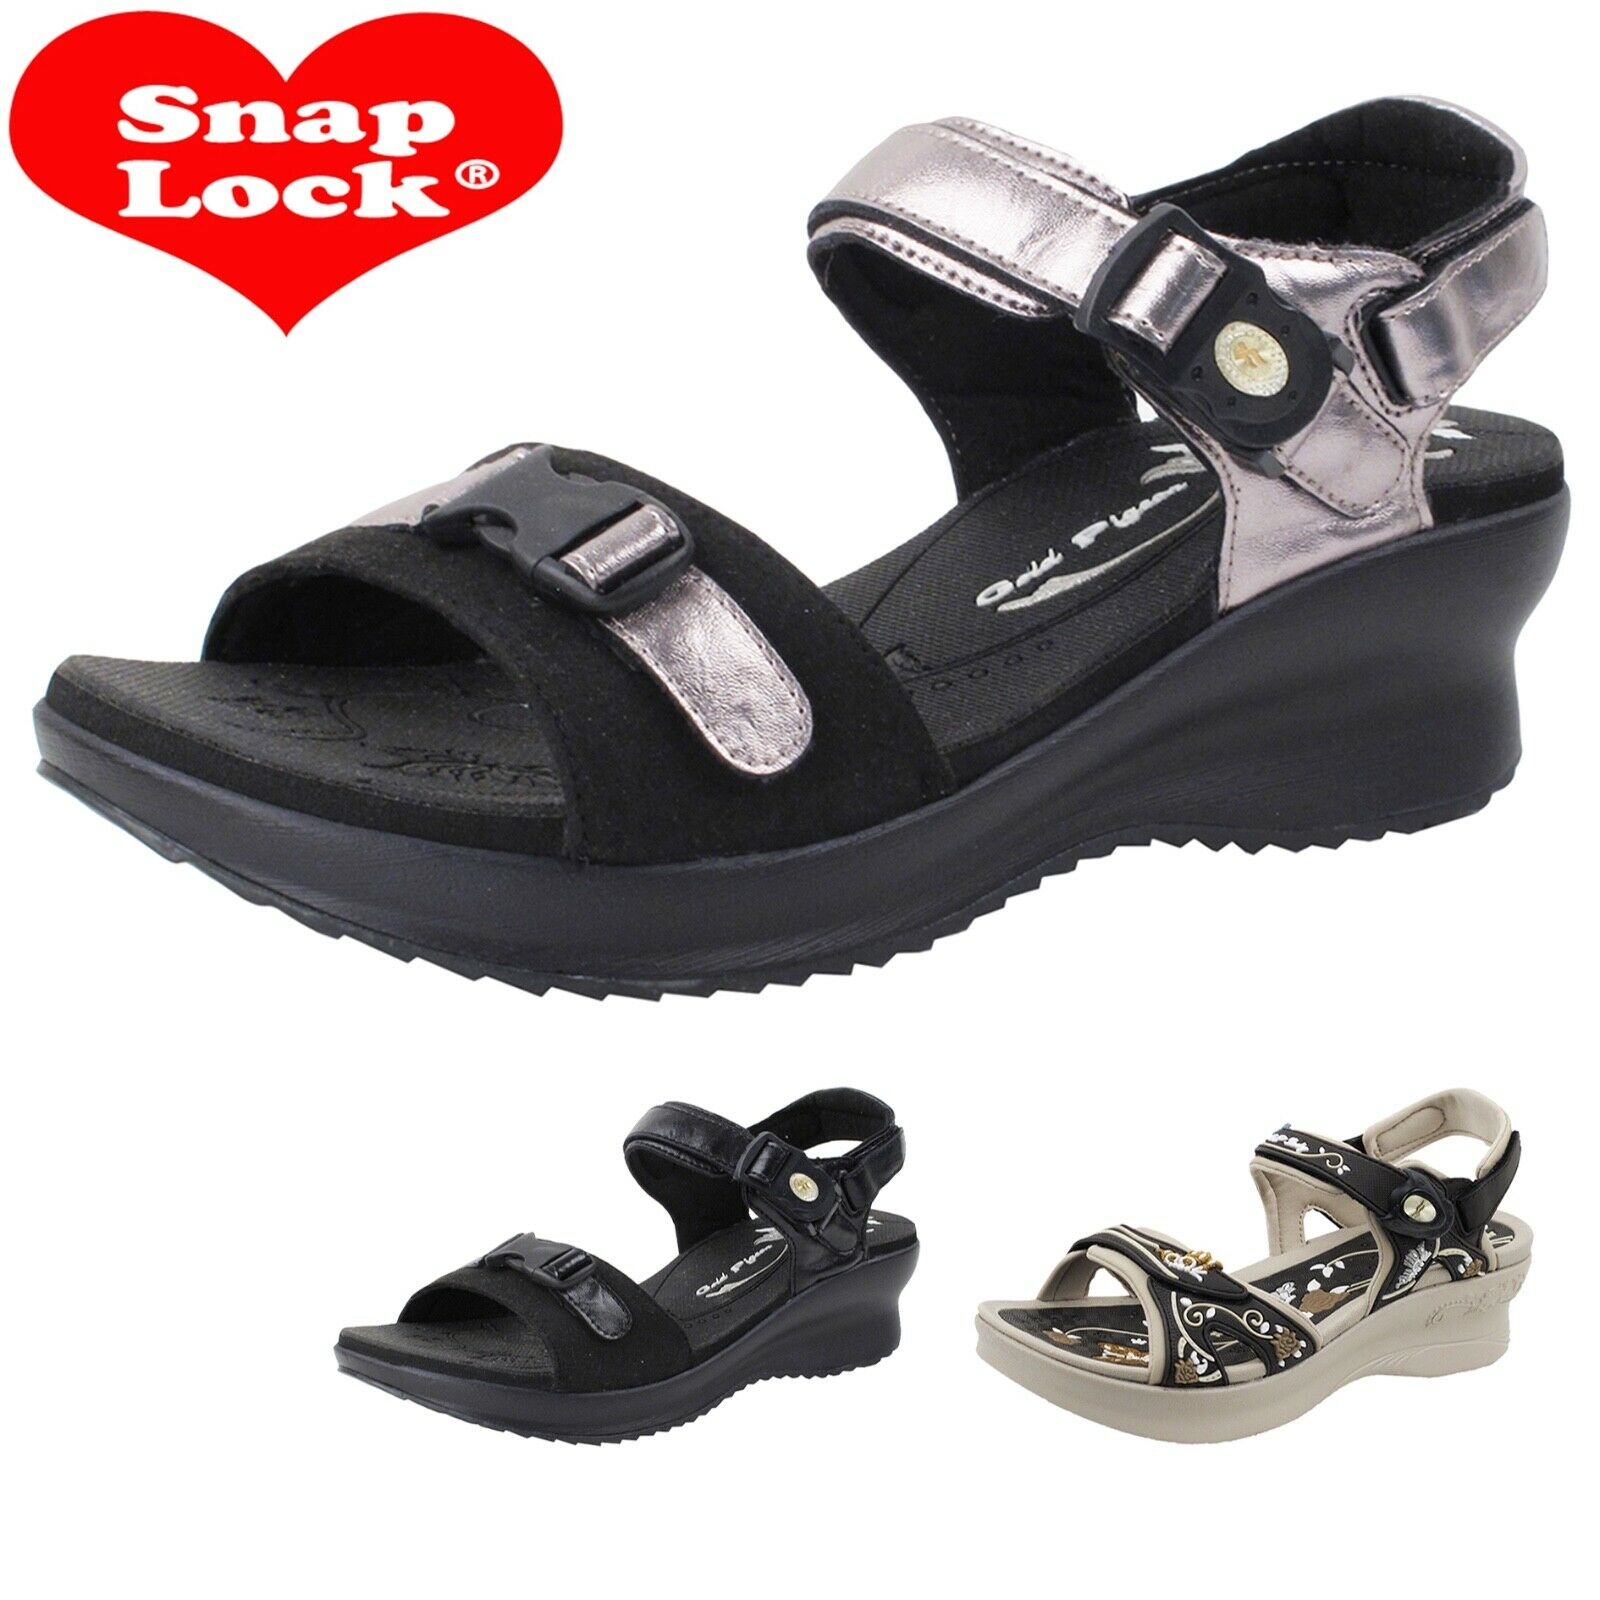 Comfort Padded Light Weight Platform Wedge Sandals for Women